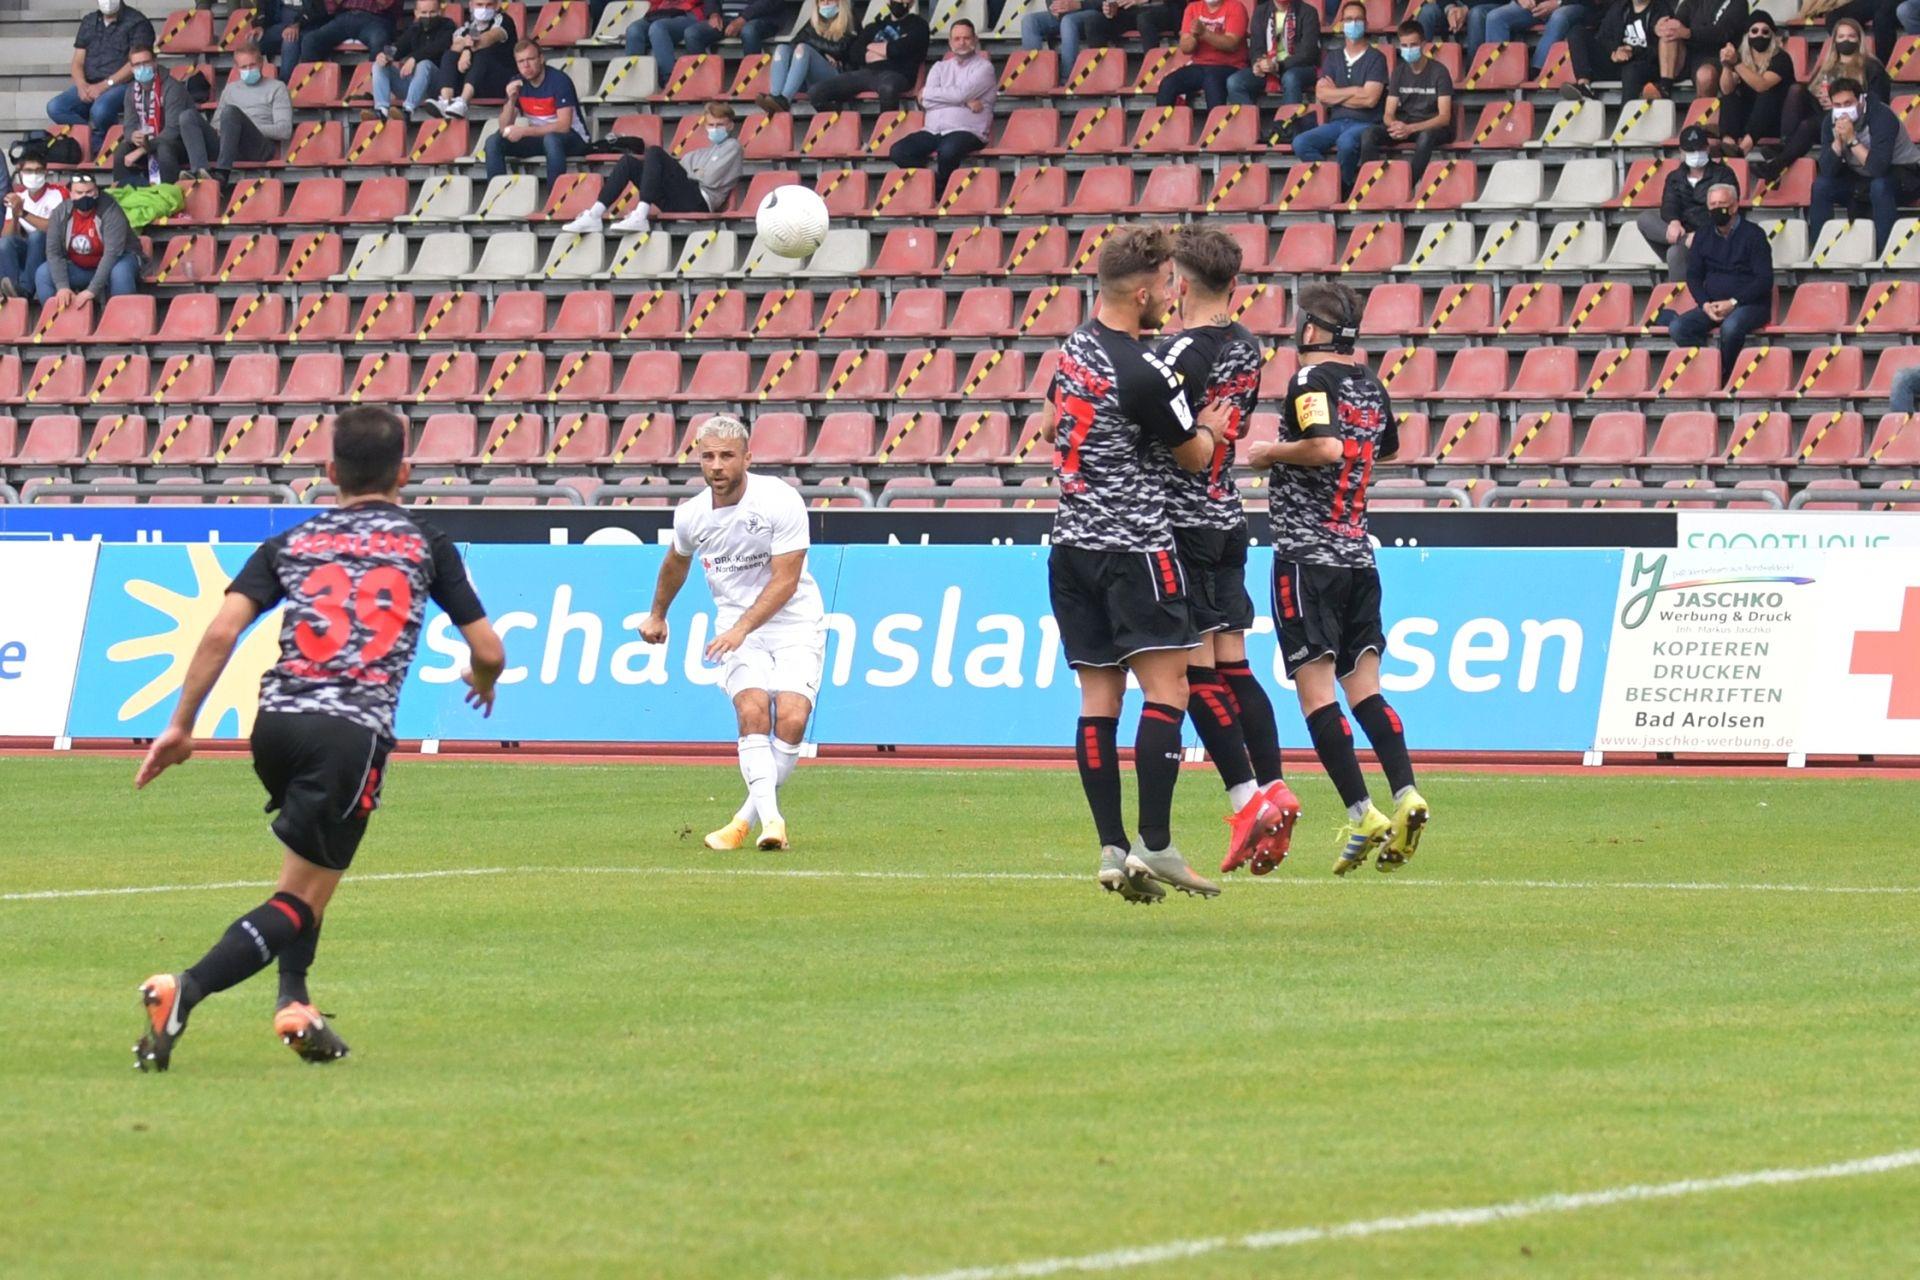 Regionalliga Südwest 2020/21, KSV Hessen Kassel, Rot-Weiss-Koblenz, Endstand 1:1, Meha